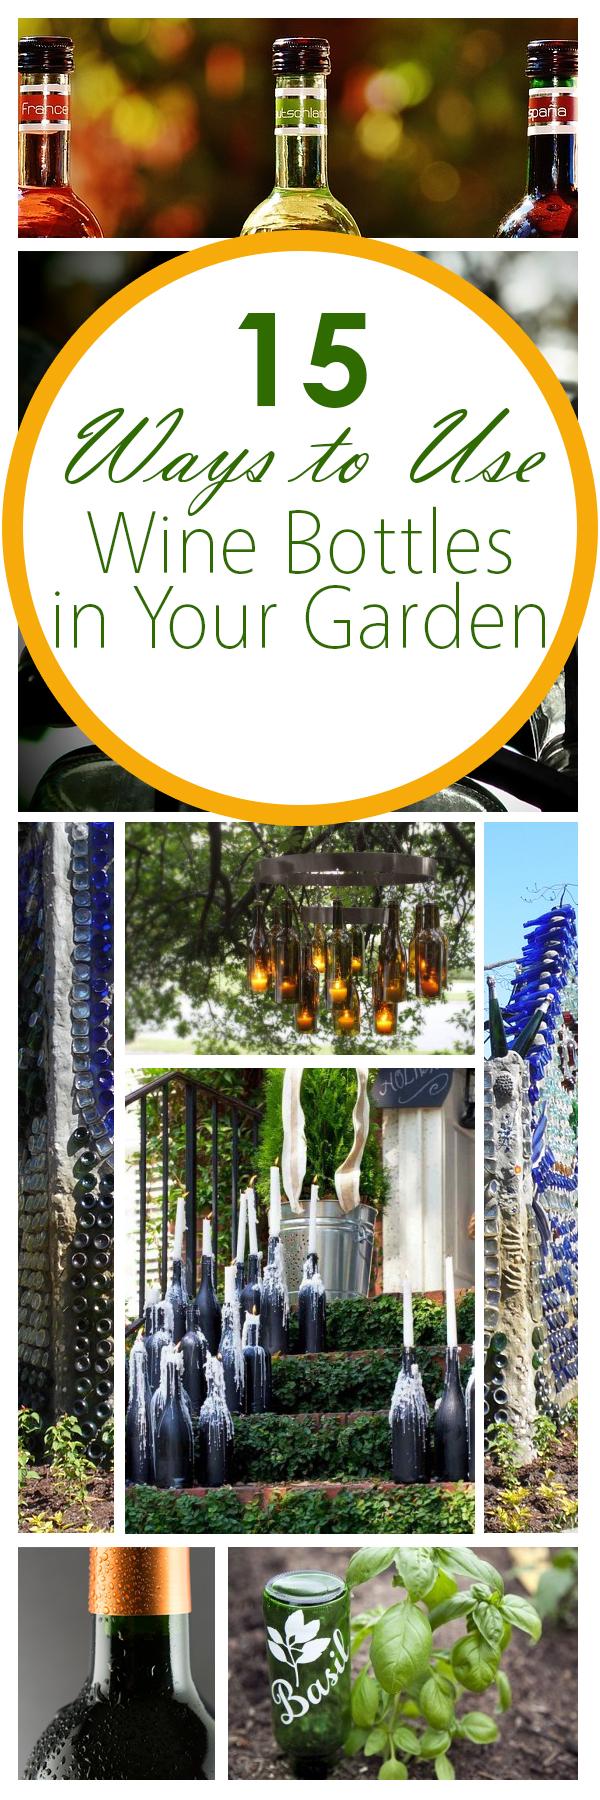 Garden projects, DIY garden, garden hacks, things to do with wine bottles, wine bottles, wine bottle craft, popular pin, crafting, outdoor living